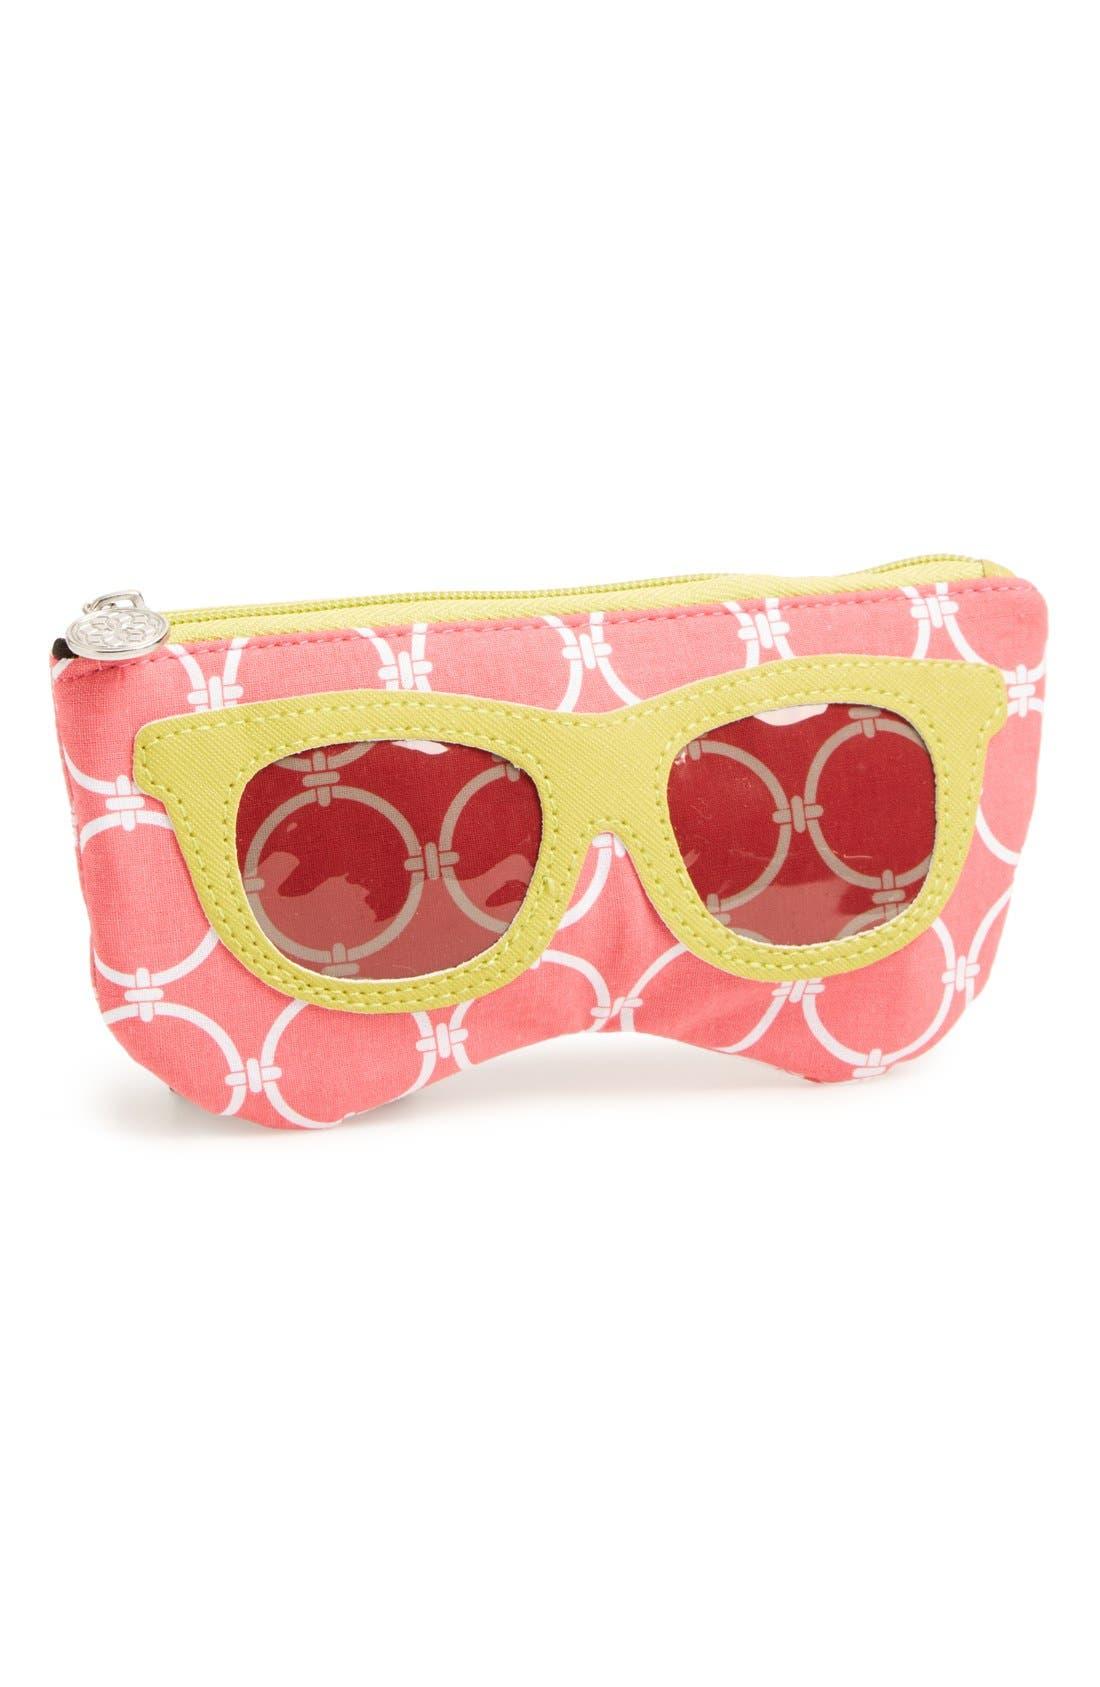 Main Image - Tri-Coastal Design Sunglasses Case